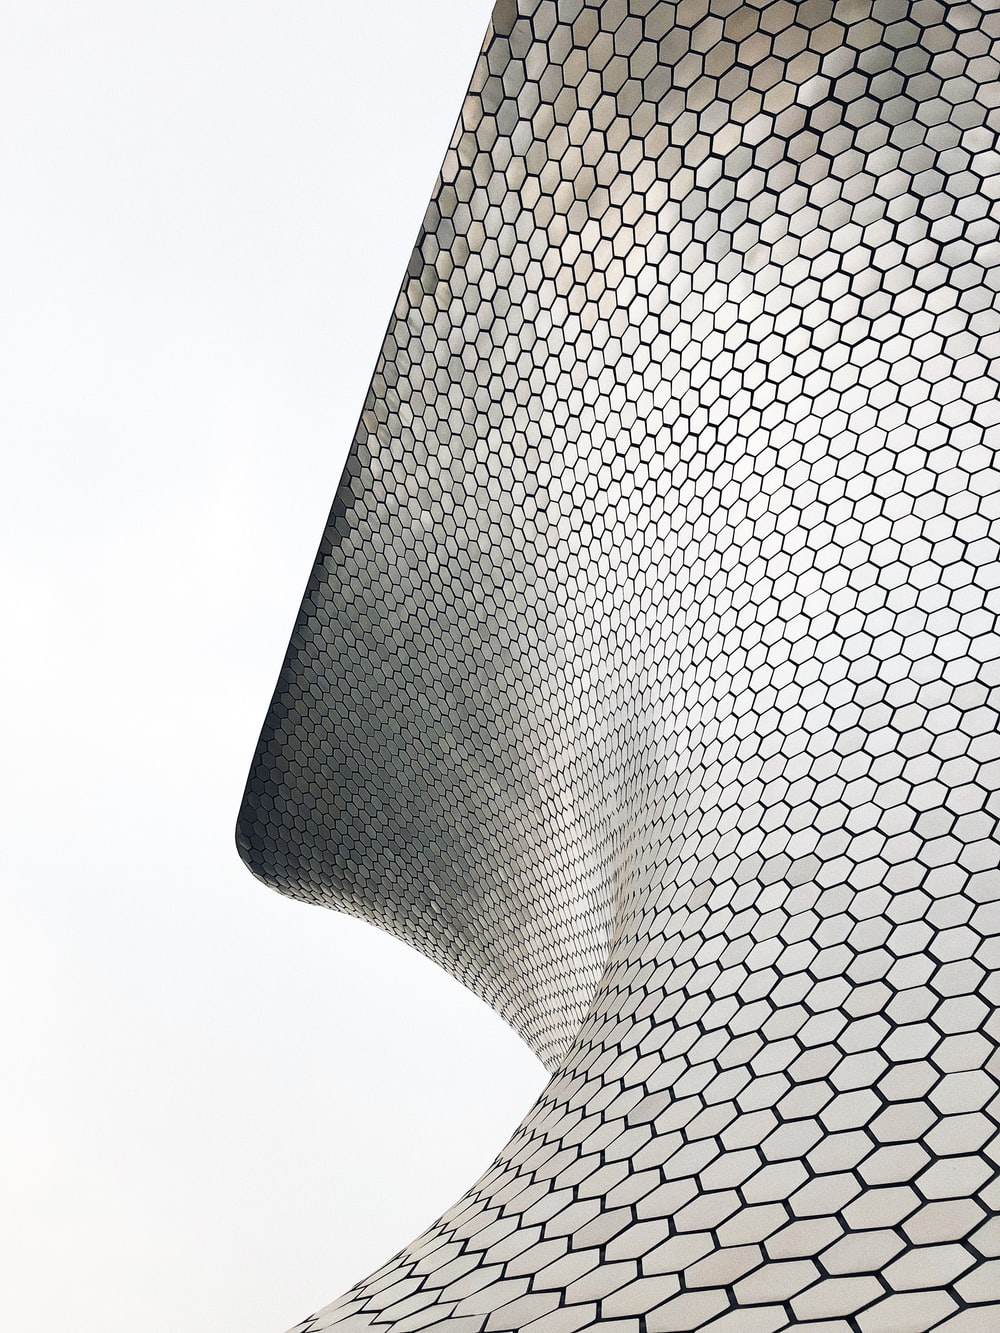 closeup photo of black and gray metal spiral pad